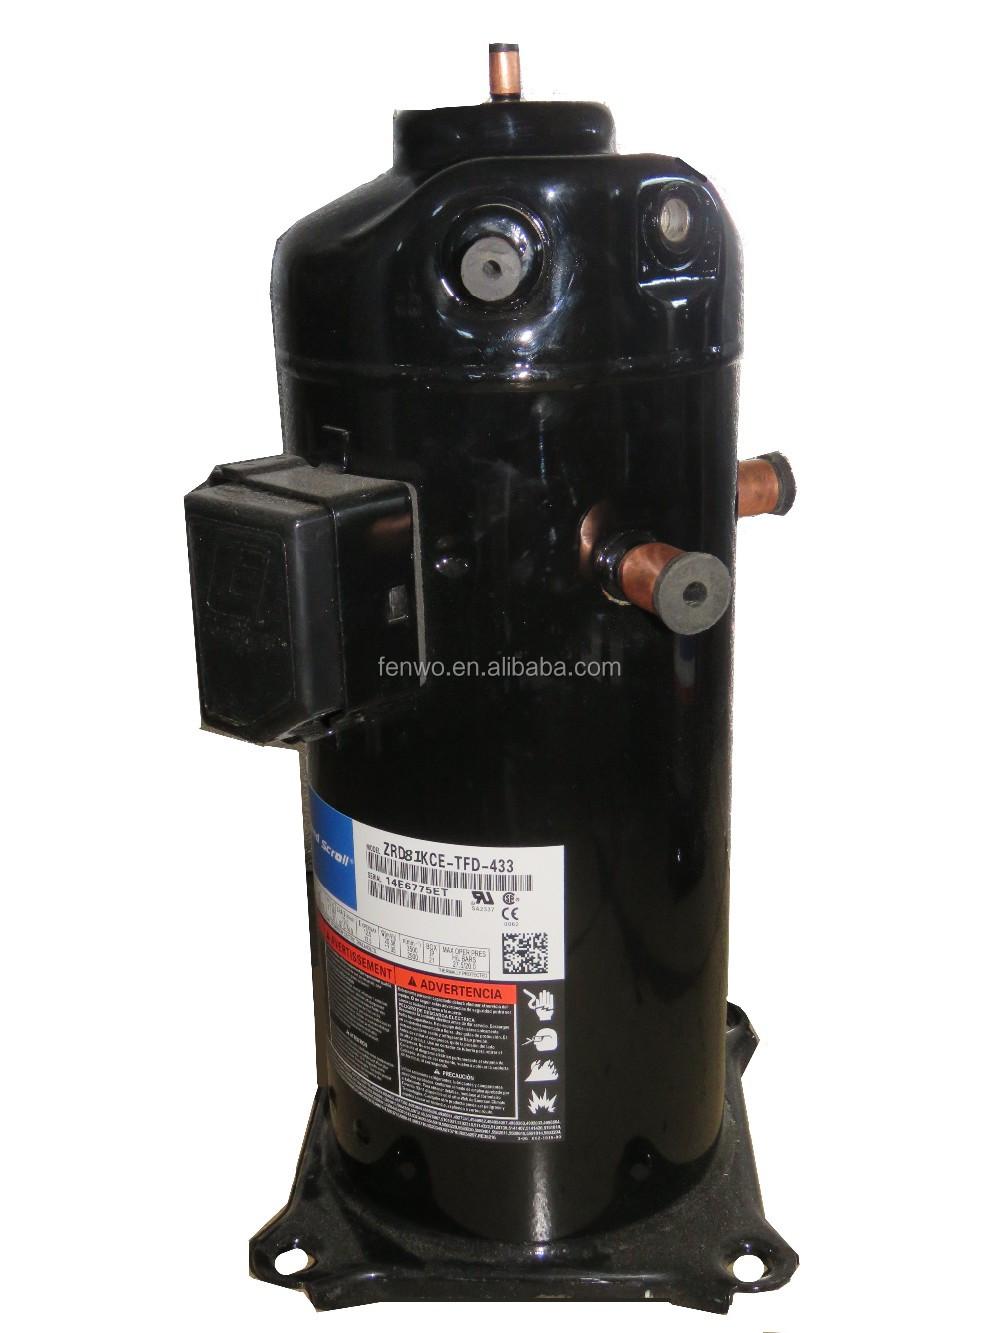 Hermetic Refrigeration Compressor Zrd81kce Copeland Digital Scroll  Compressor Pdf - Buy Copeland Digital Scroll Compressor Pdf,Hermetic  Refrigeration